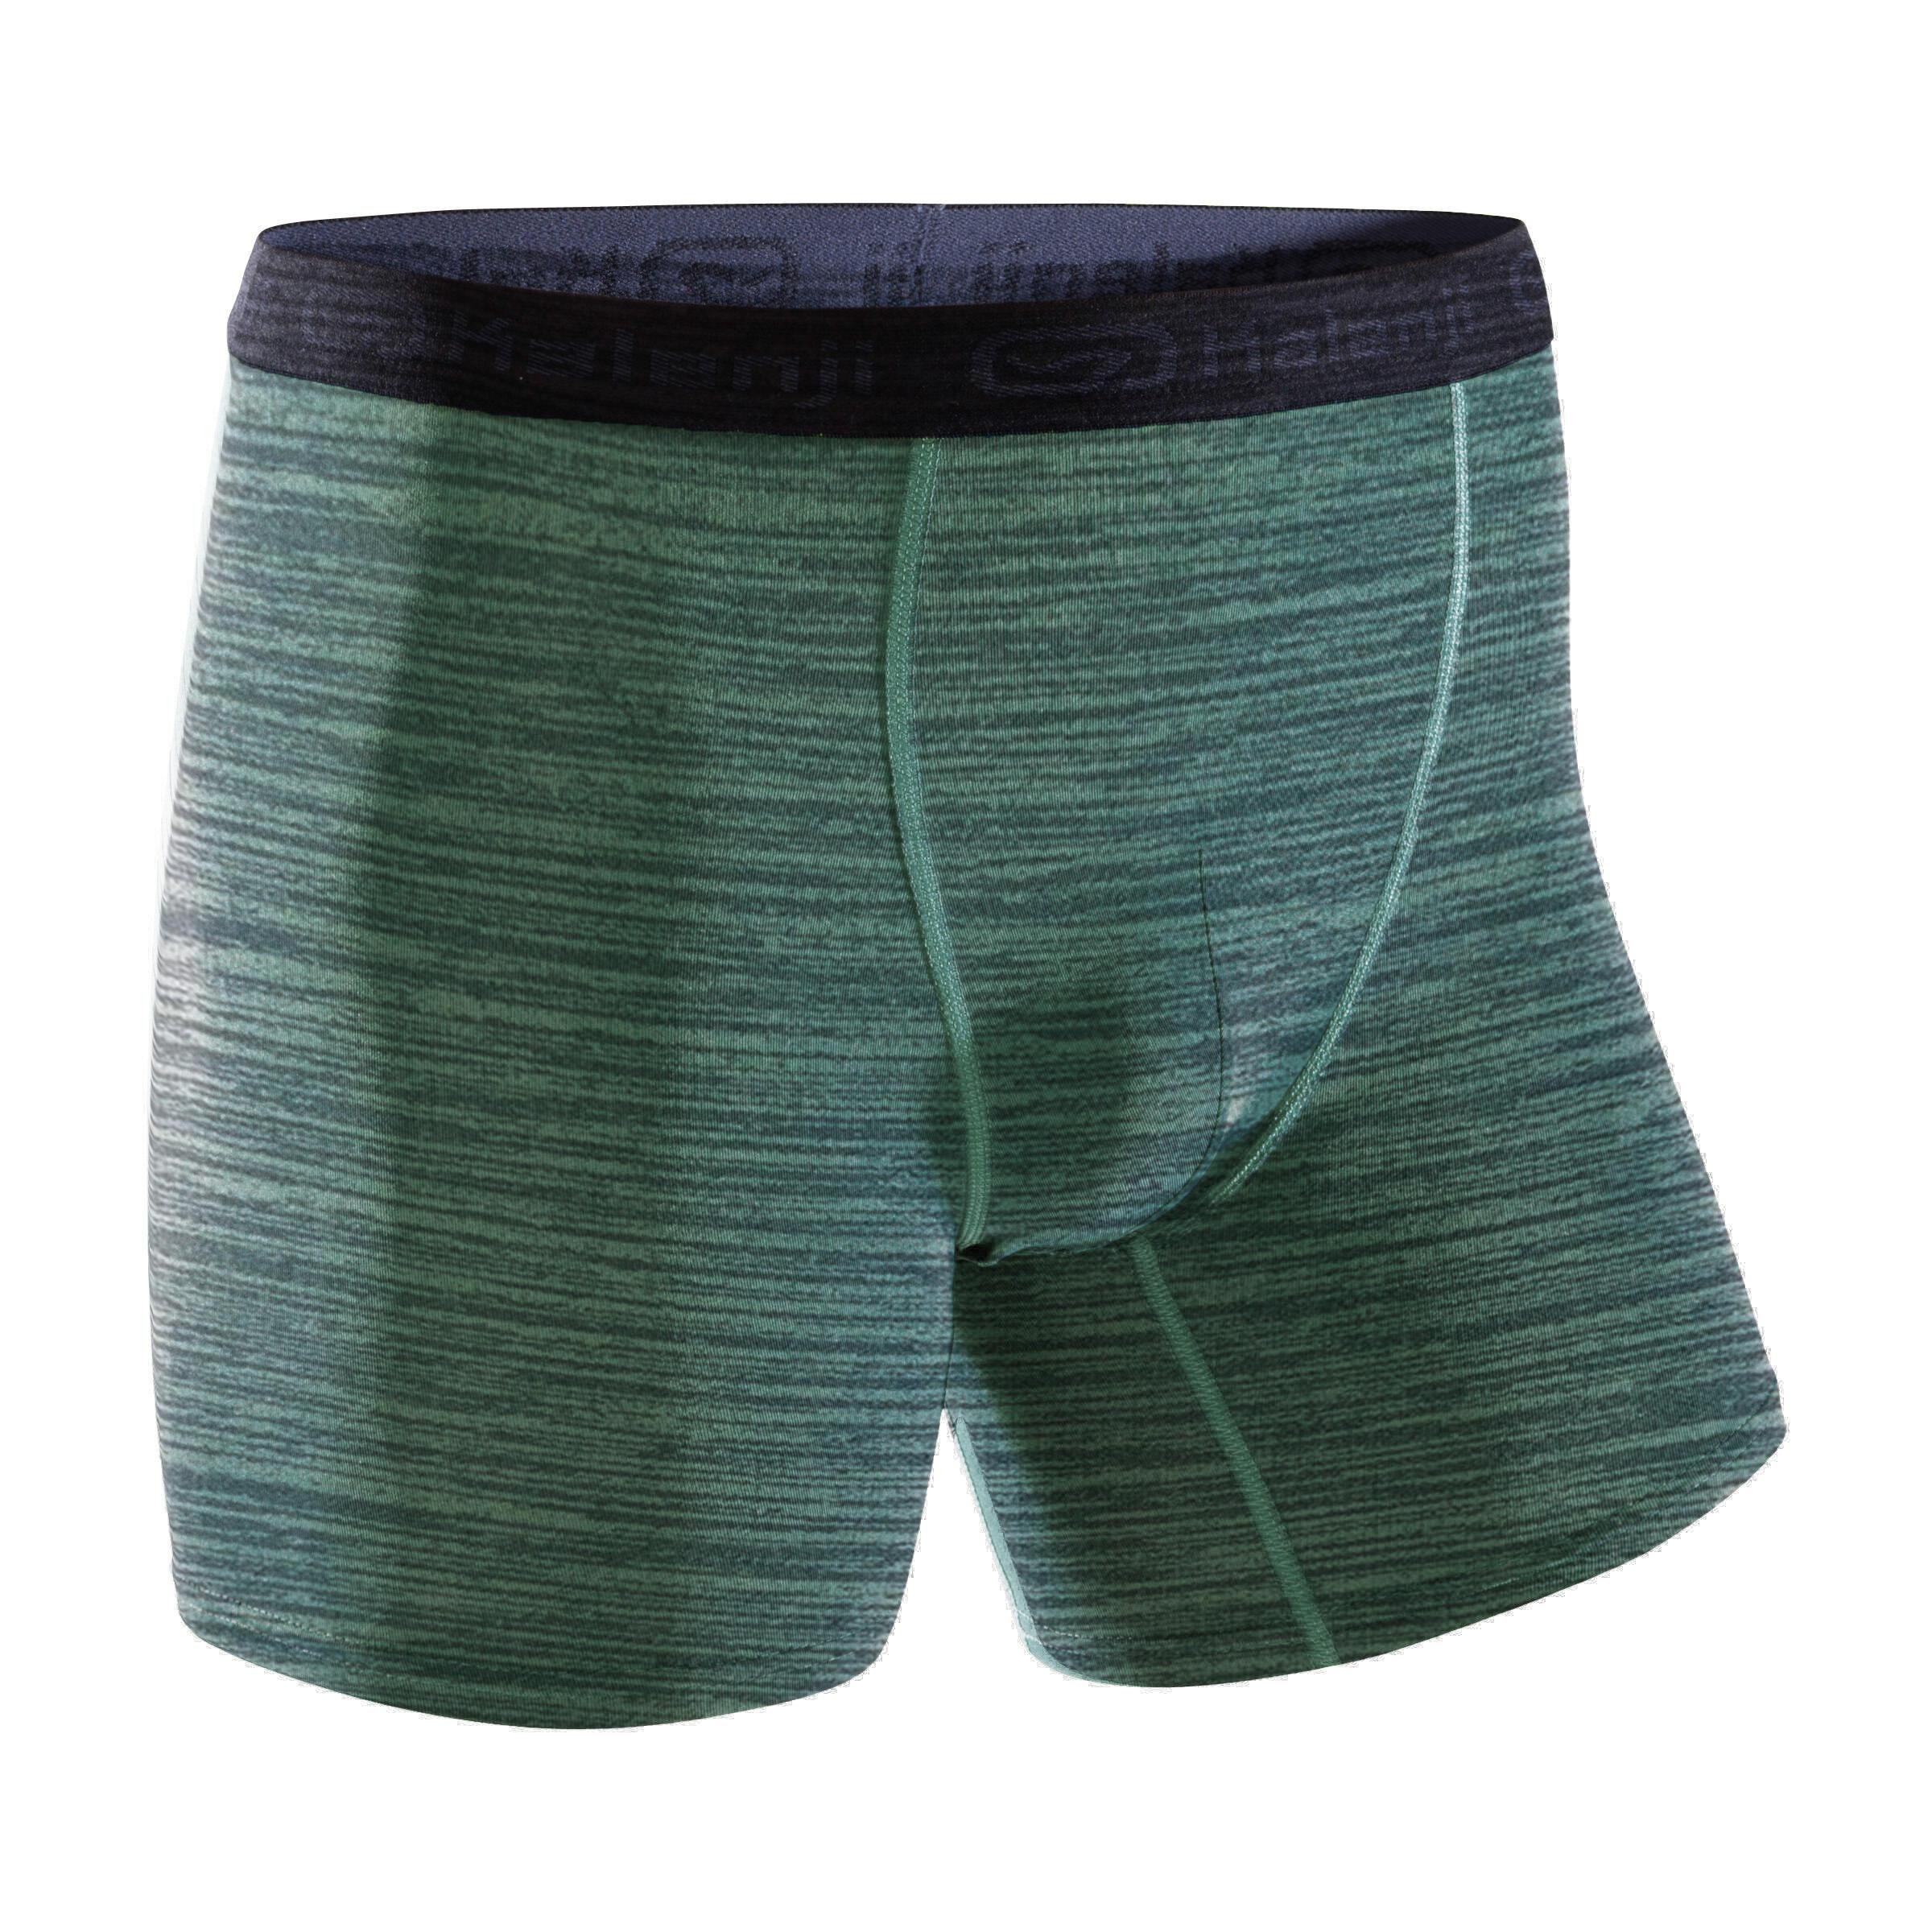 Laufshorts atmungsaktiv Herren dunkelkhaki | Sportbekleidung > Sporthosen > Laufhosen | Kalenji